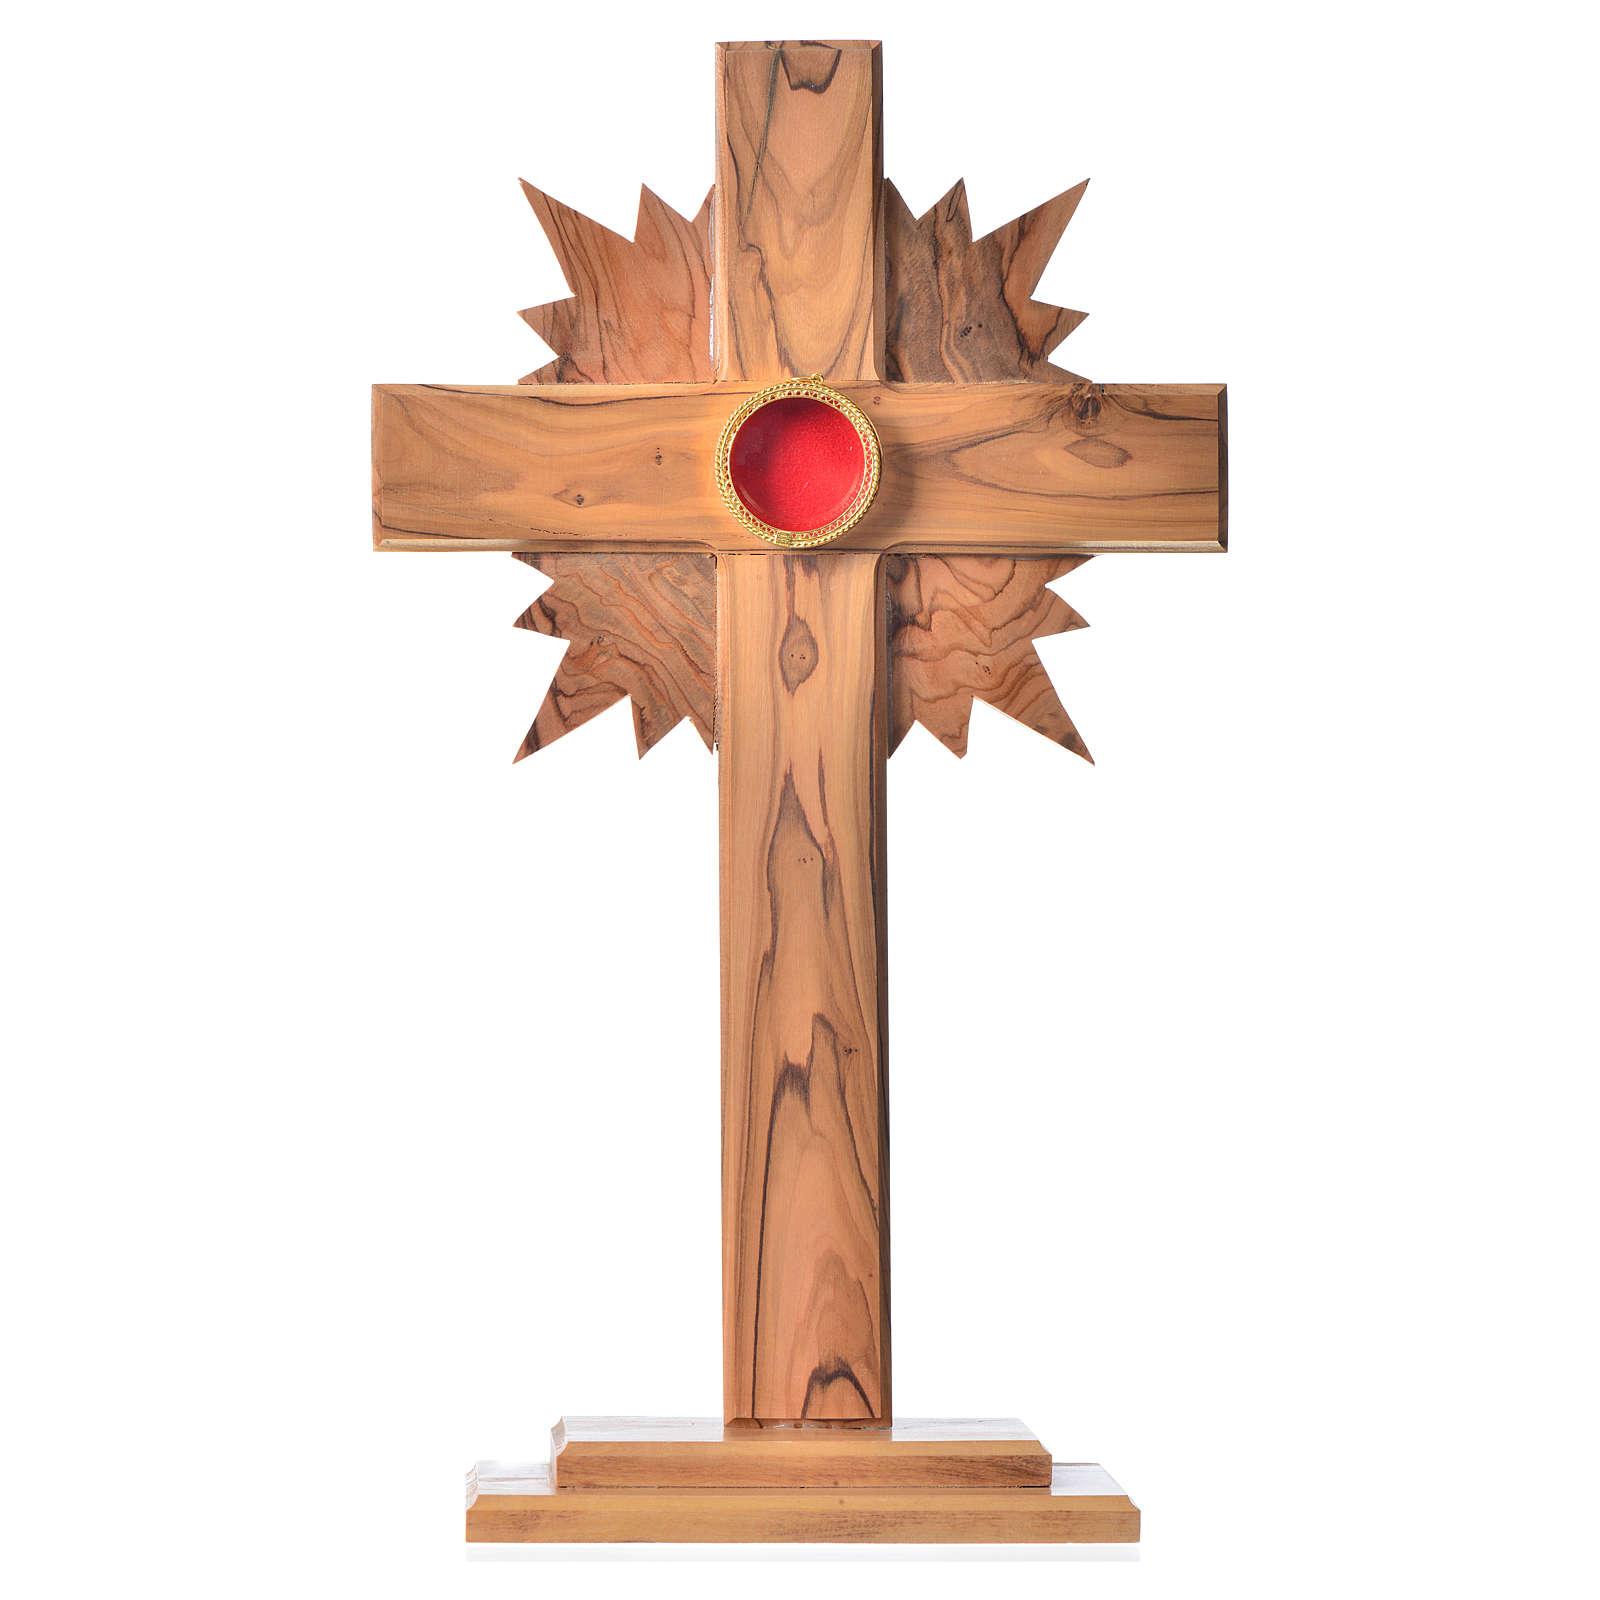 Relicario madera olivo cruz 29 cm vidrio redondo plata 800 4